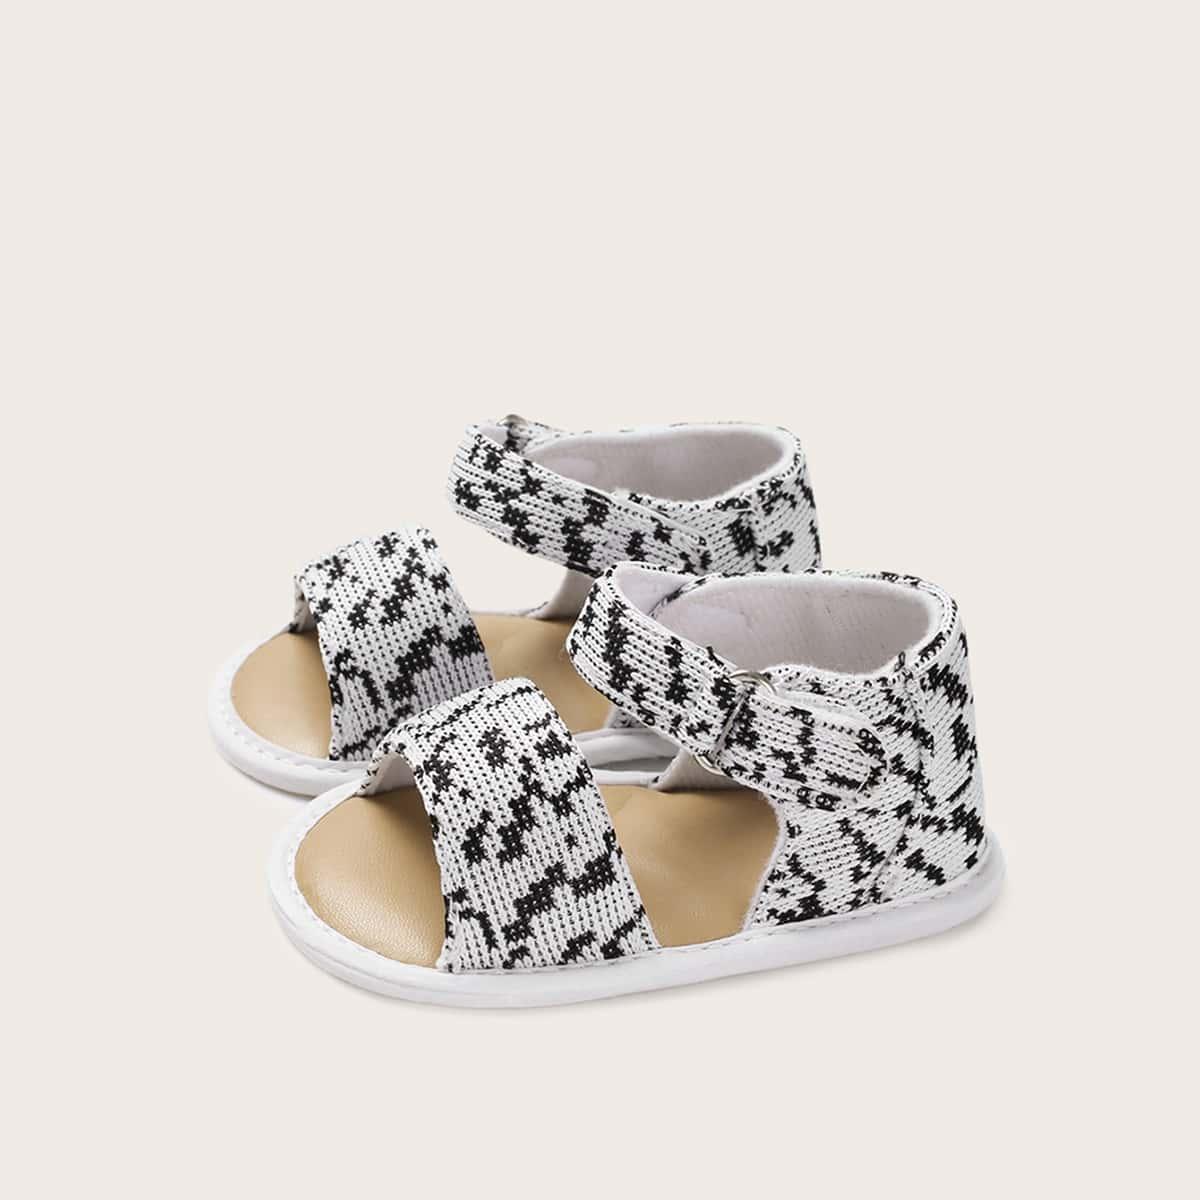 Klittenband sandalen met open teen en babymeisje